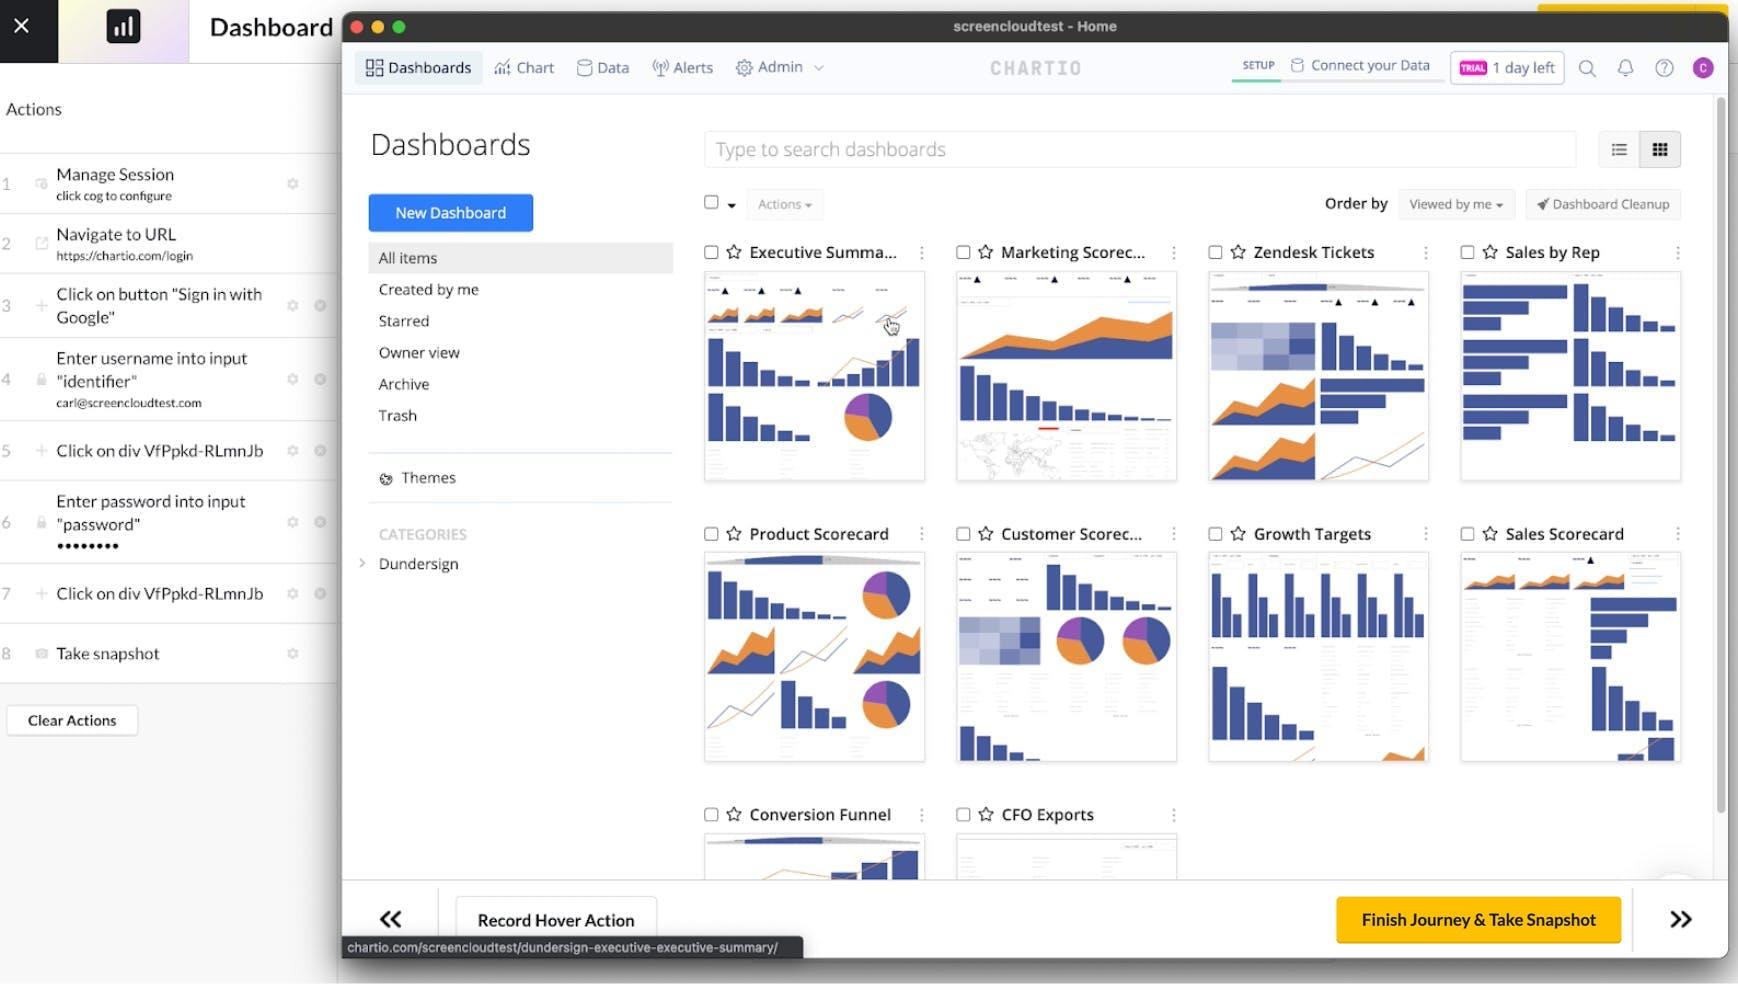 ScreenCloud Dashboard App Guide - Set up snapshot journey 2.jpeg